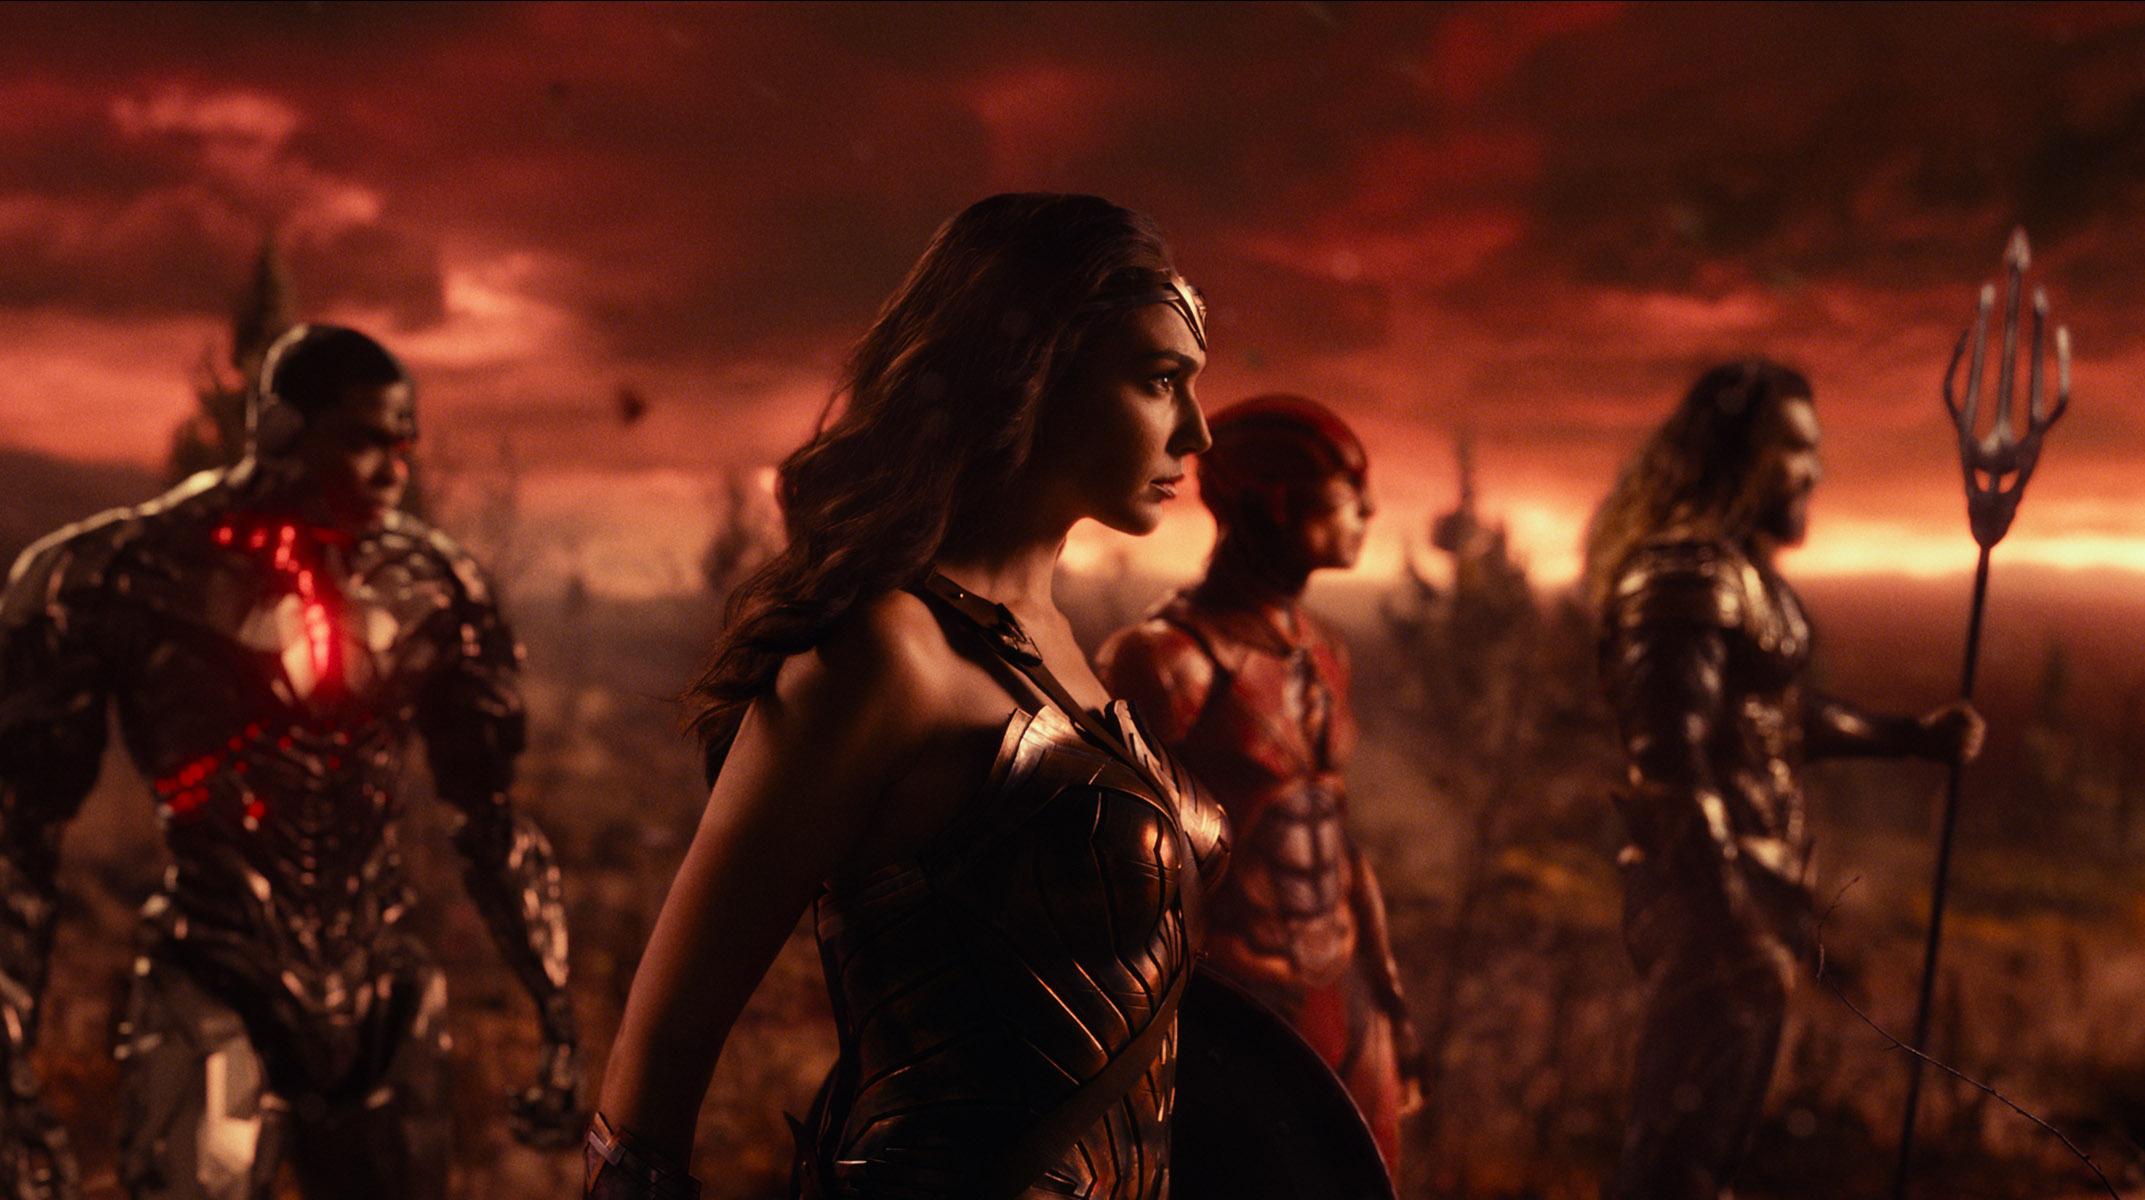 Justice-League-DC-Movie-DCEU-Cyborg-Flash-Batman-Superman-Aquaman-Wonder-Woman-Red-Sky-Easter-Egg